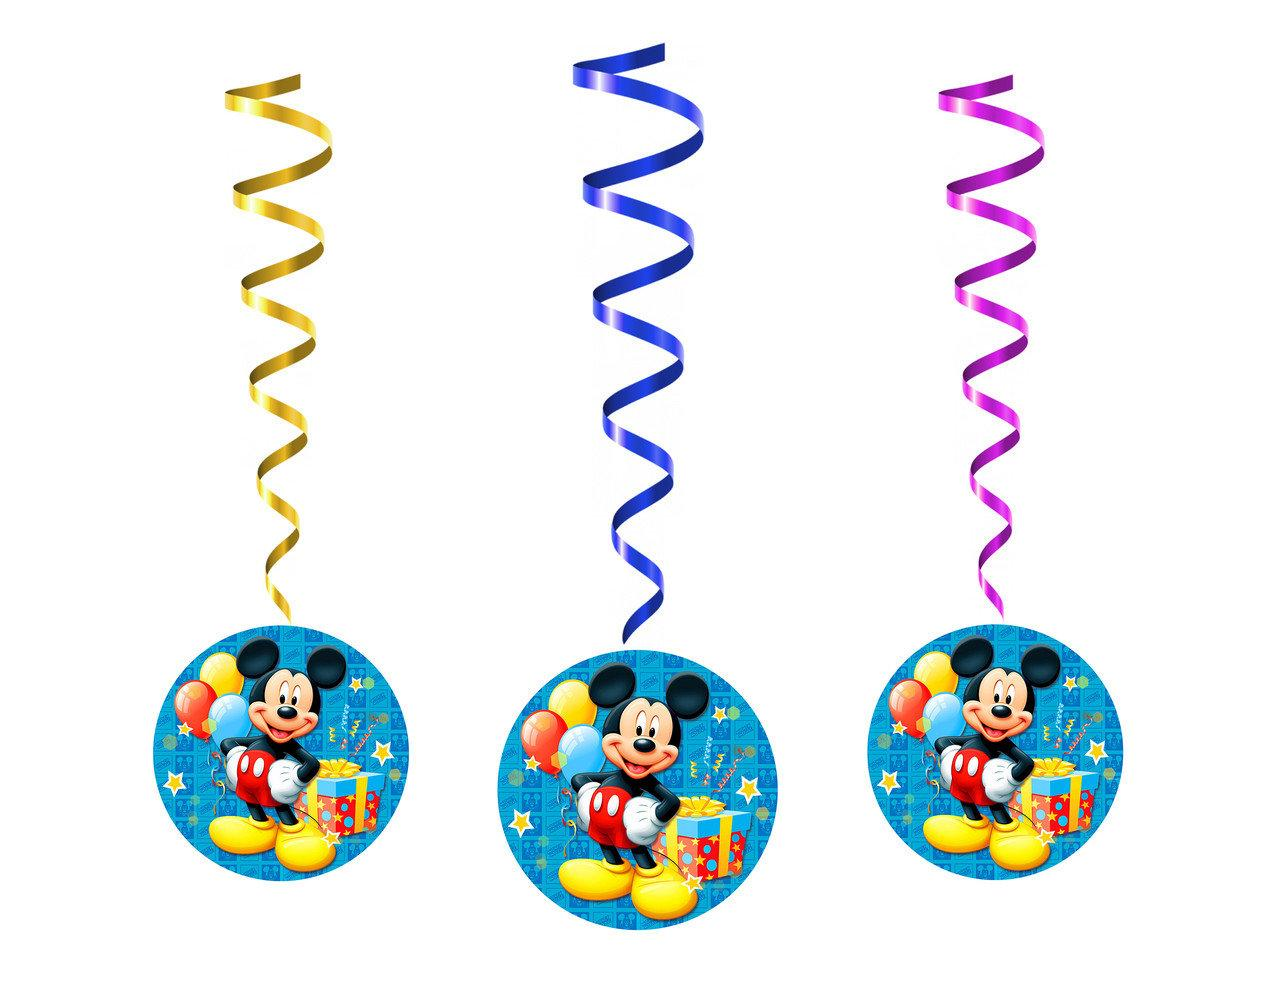 Бумажные гирлянды на спиральках Микки Маус 5 шт.